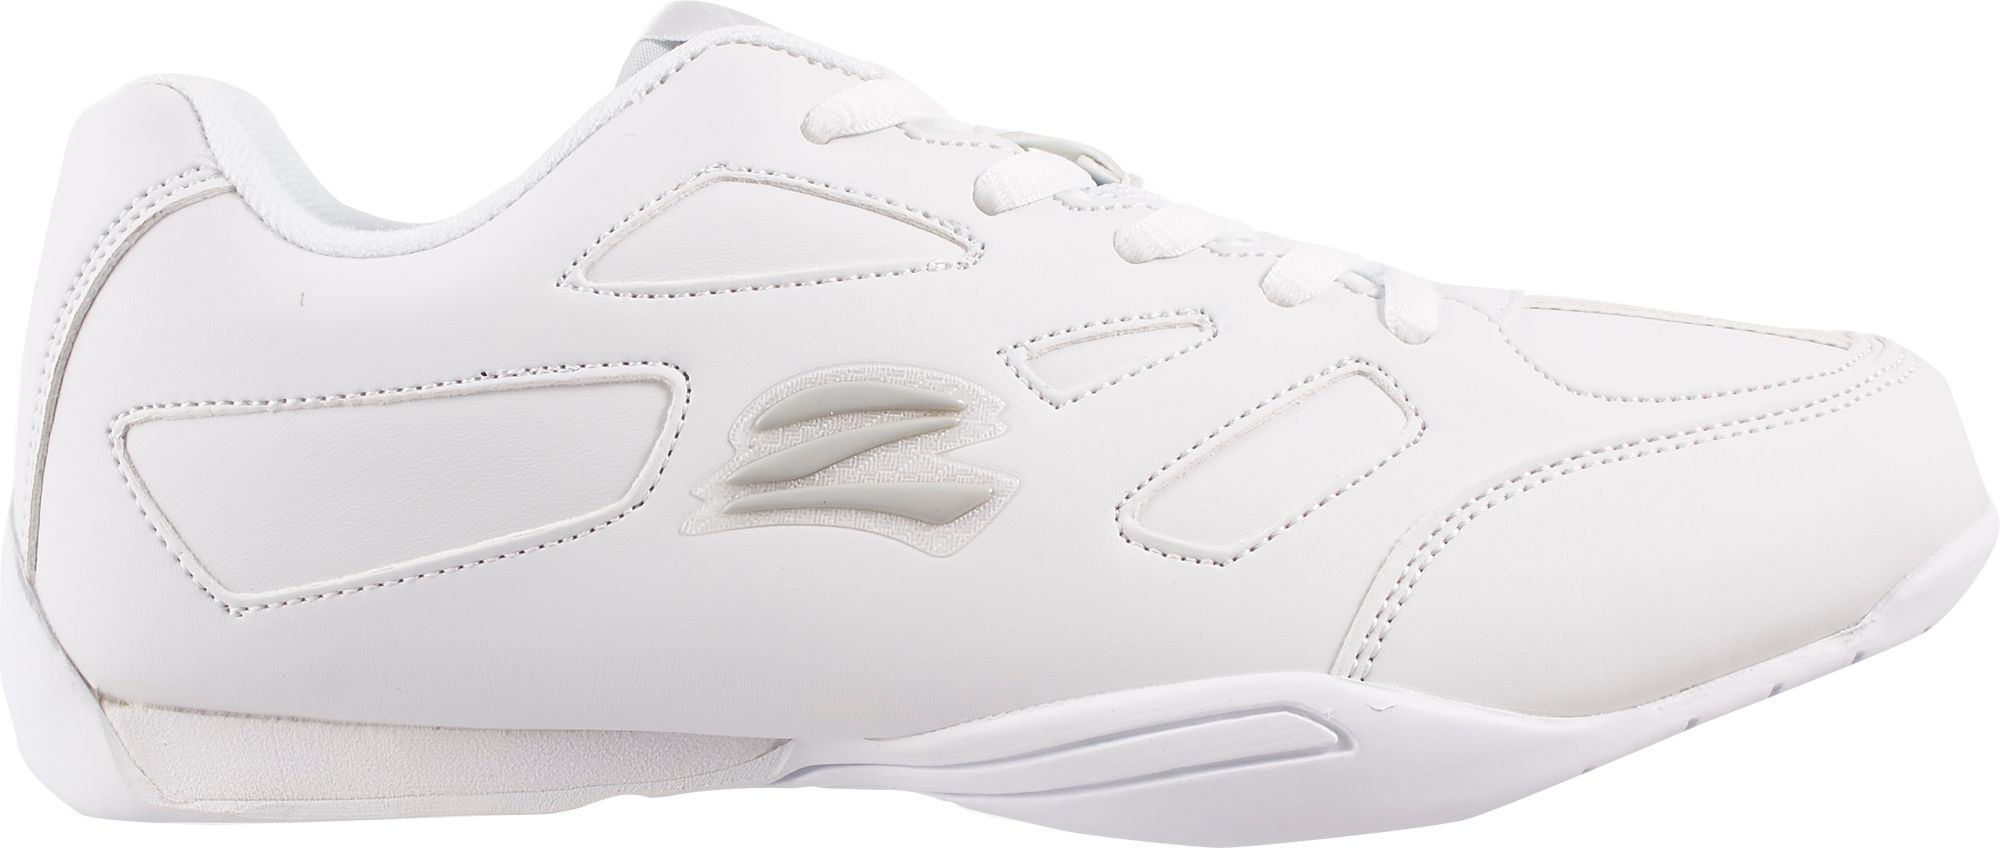 zephz Zenith Women's Cheerleading Shoes White